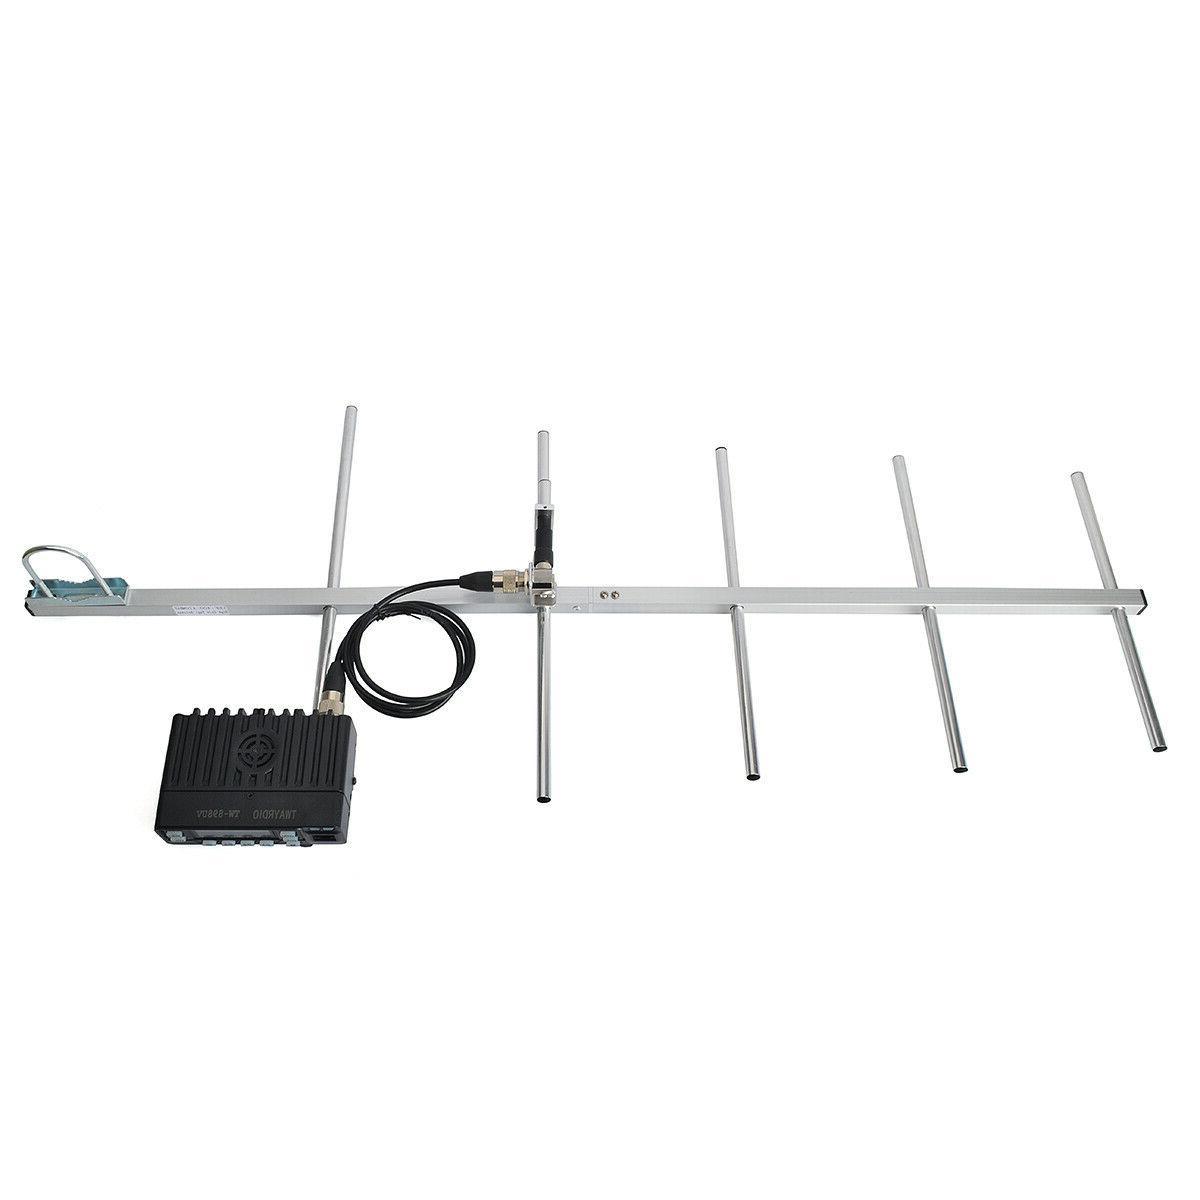 HYS UHF Directional Antenna Yagi 400-470MHz 5 Elements 9 Gain